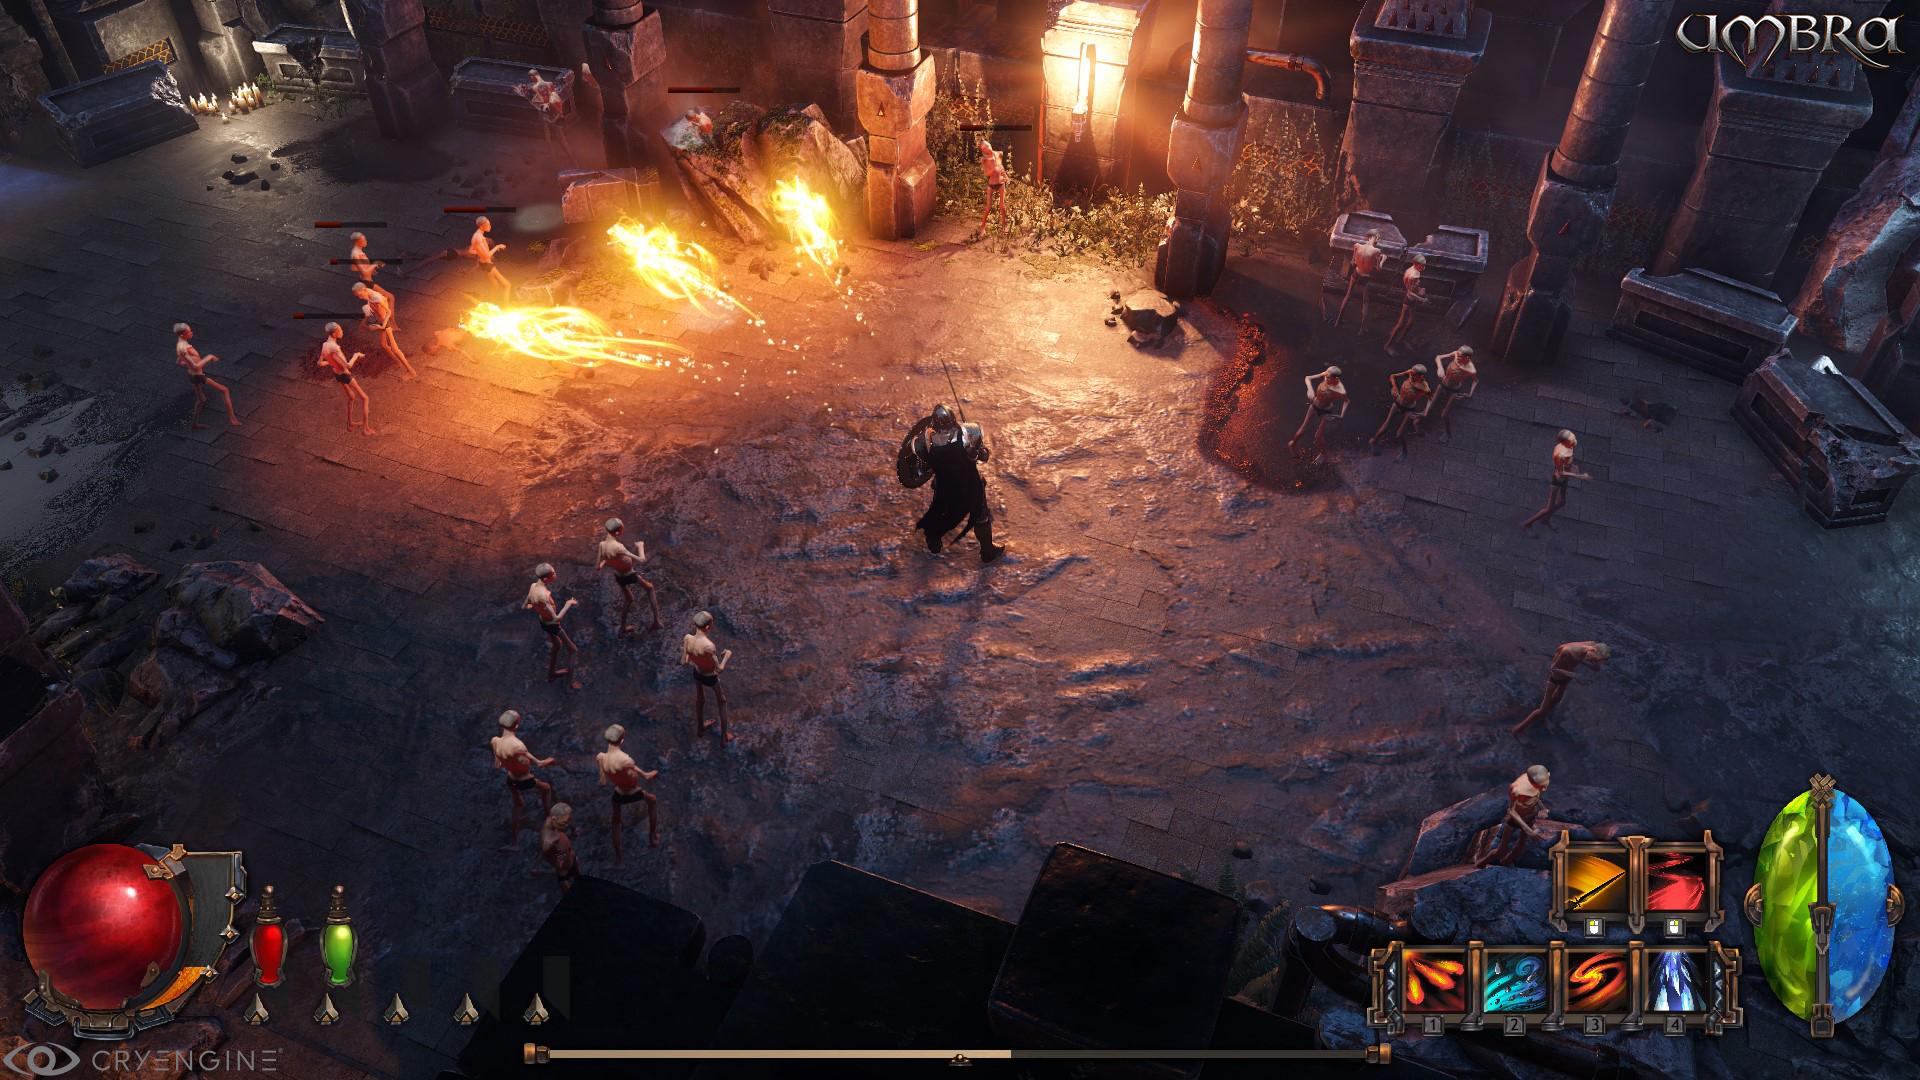 Umbra Gameplay Teaser